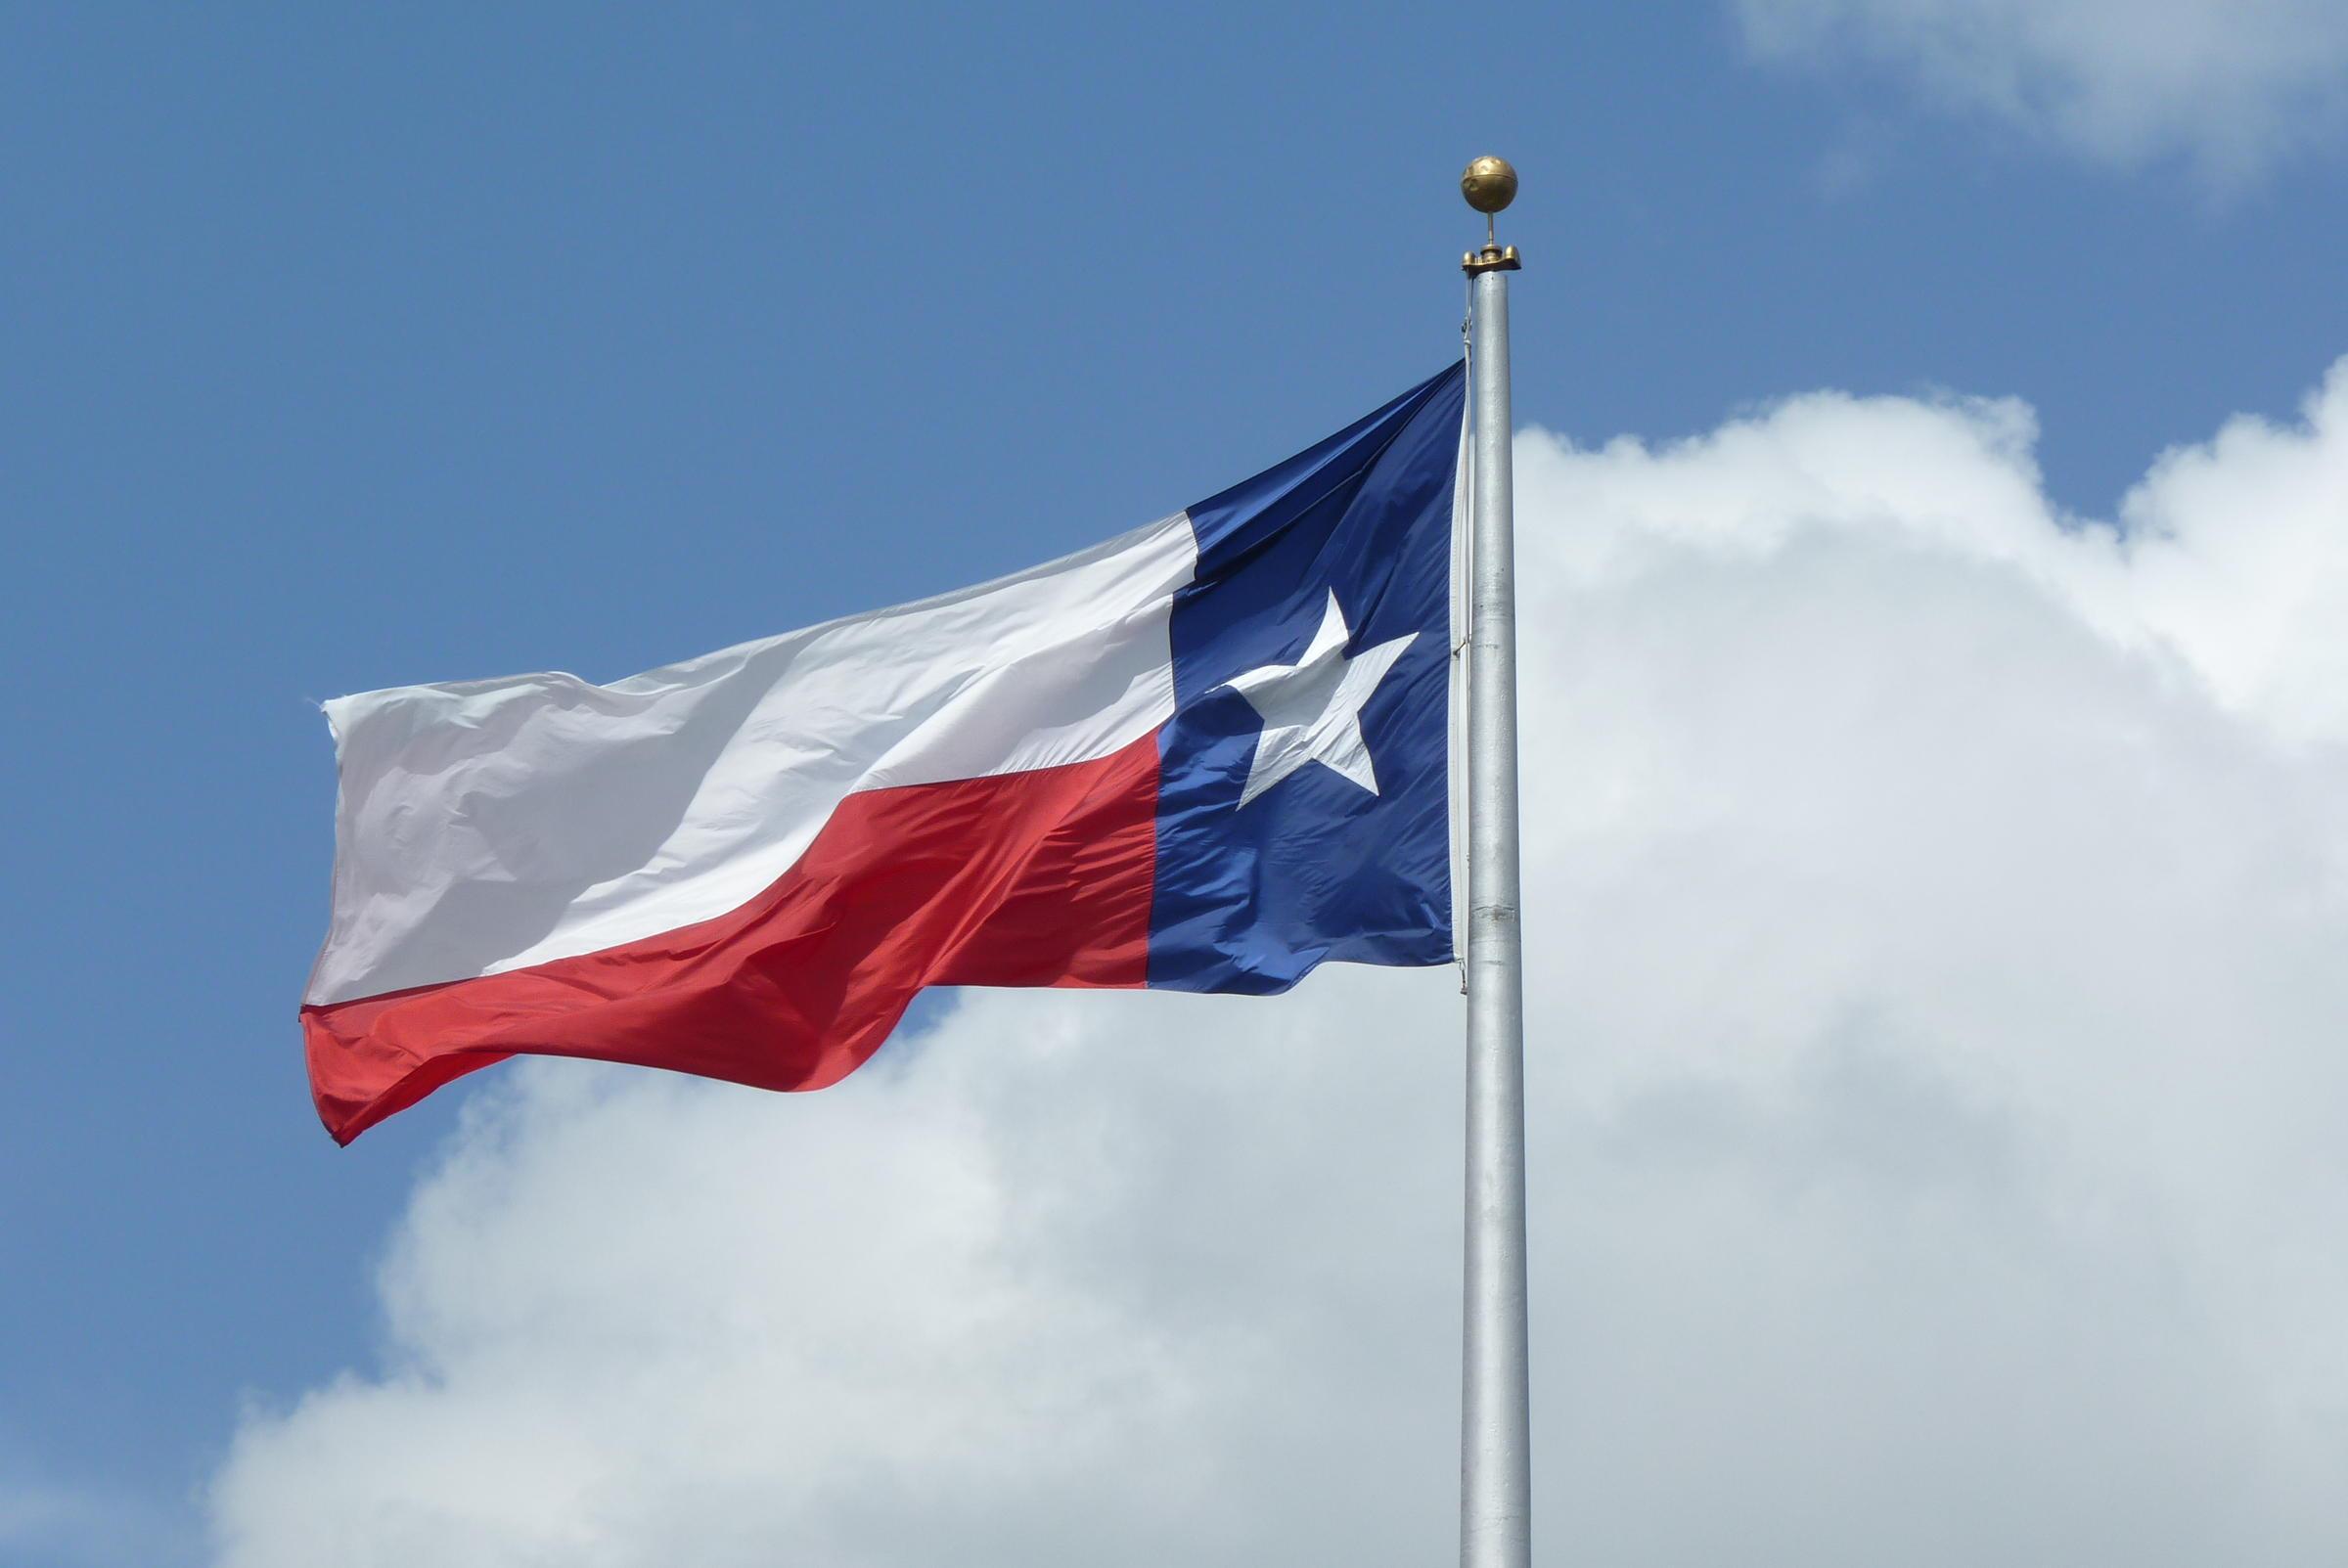 Texas Flag Waving in the Sky